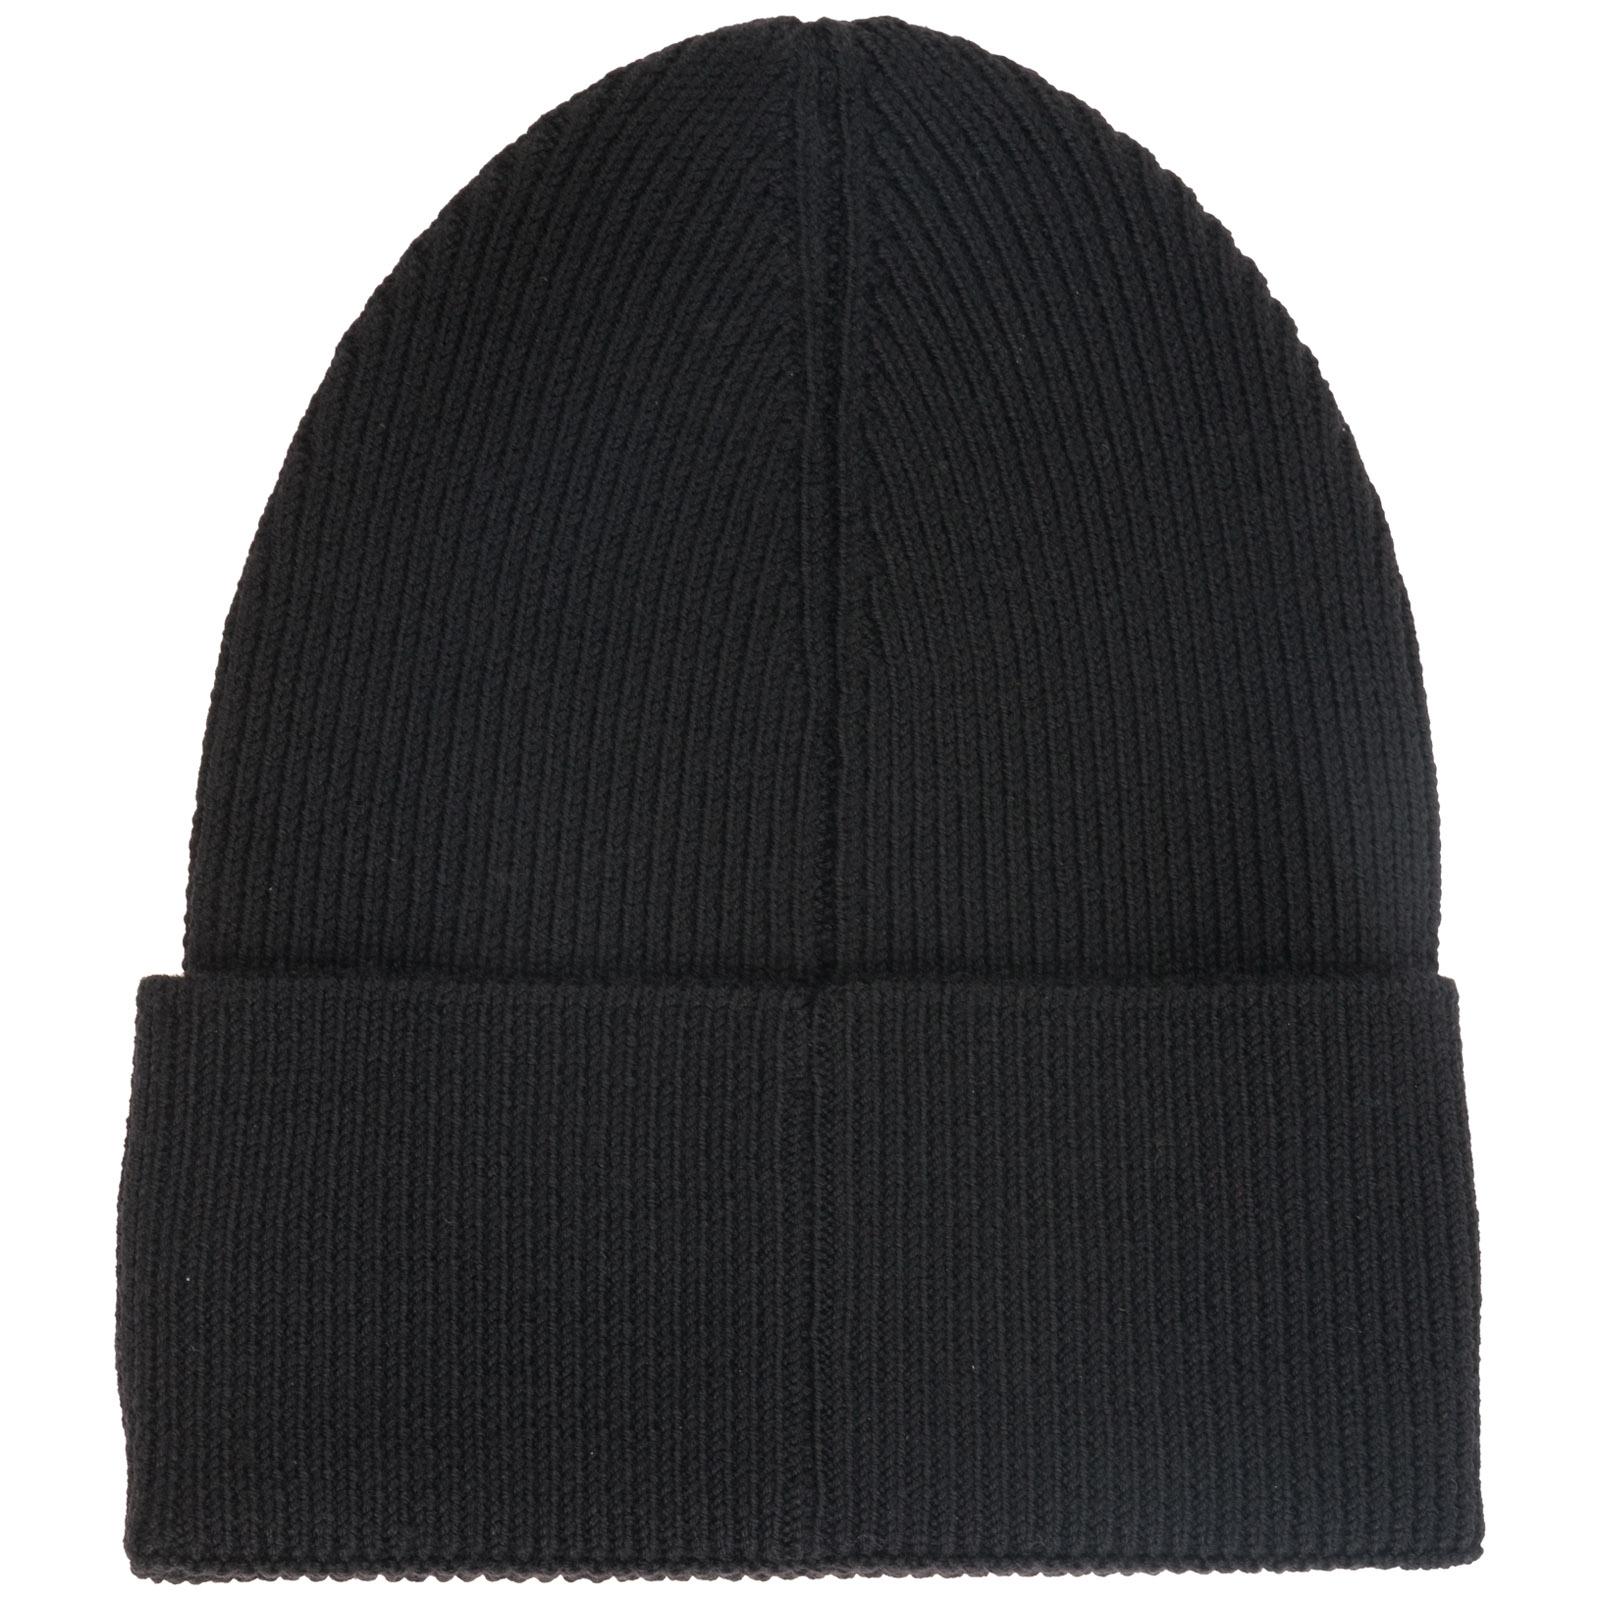 Men's wool beanie hat